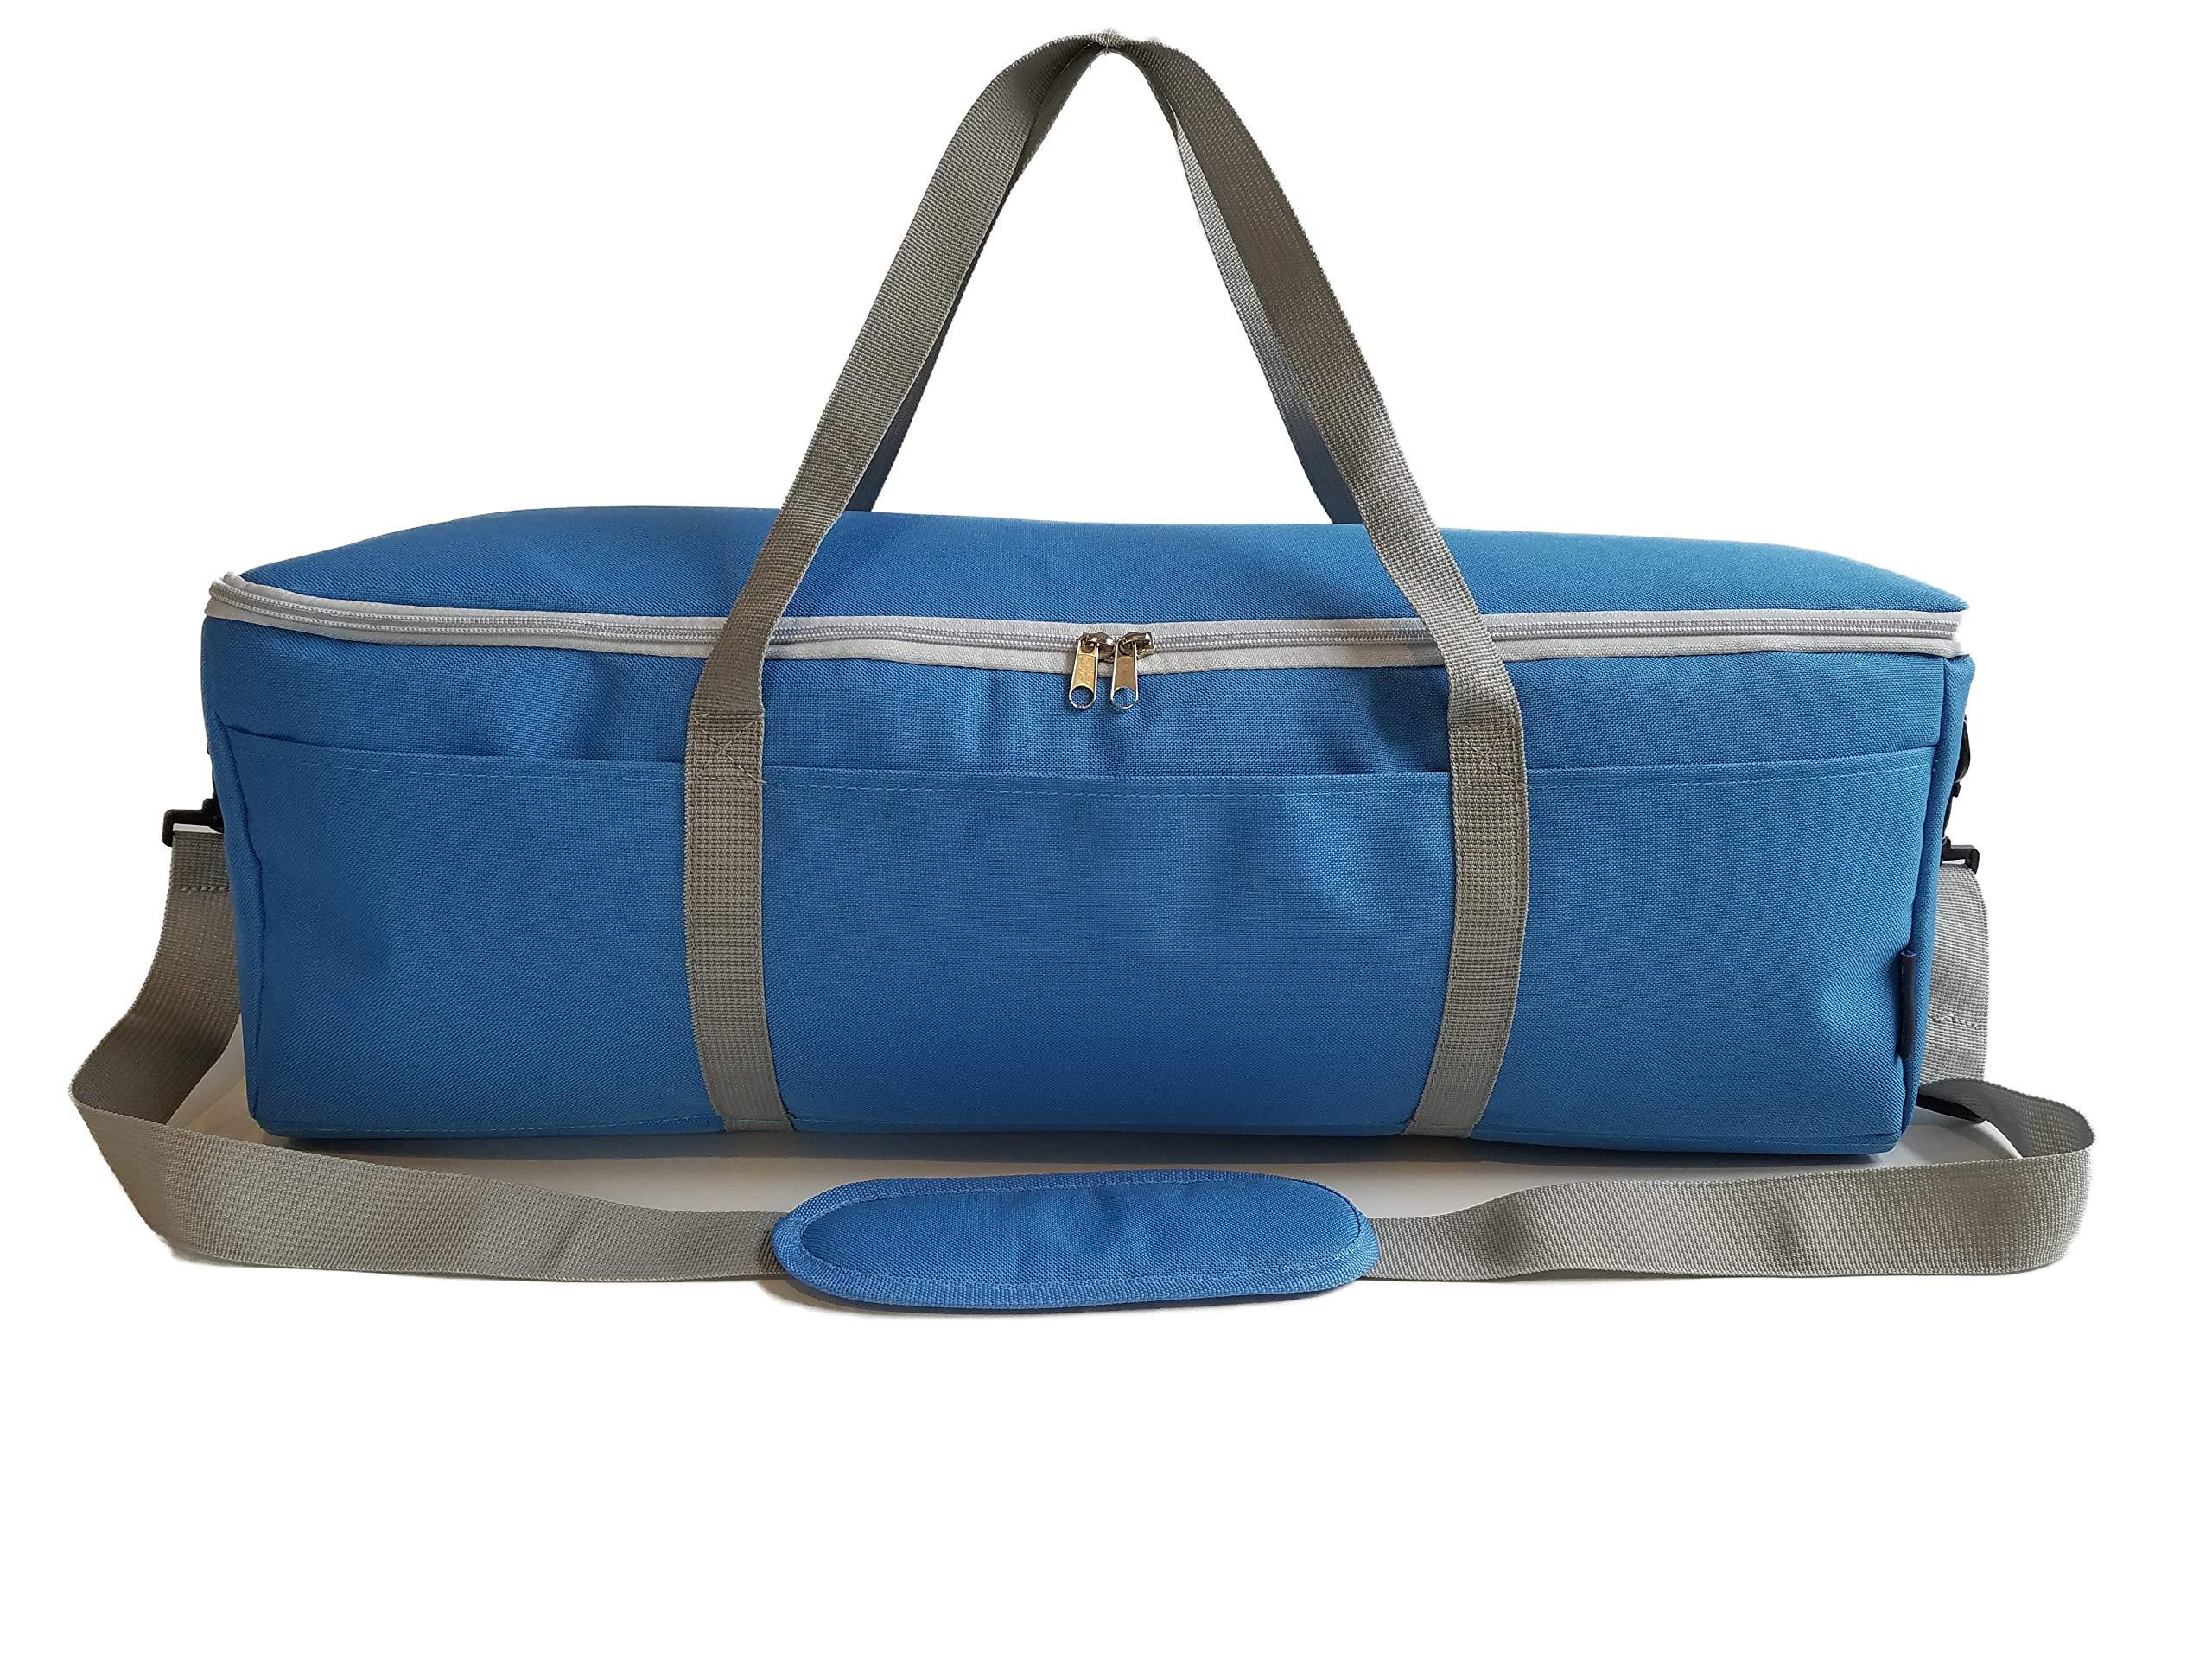 StarPlus2 Padded Craft Machine Shoulder Carry Bag, Sized to Fit Cricut Explore, Explore Air, Explore Air 2, Explore One, Maker - Blue